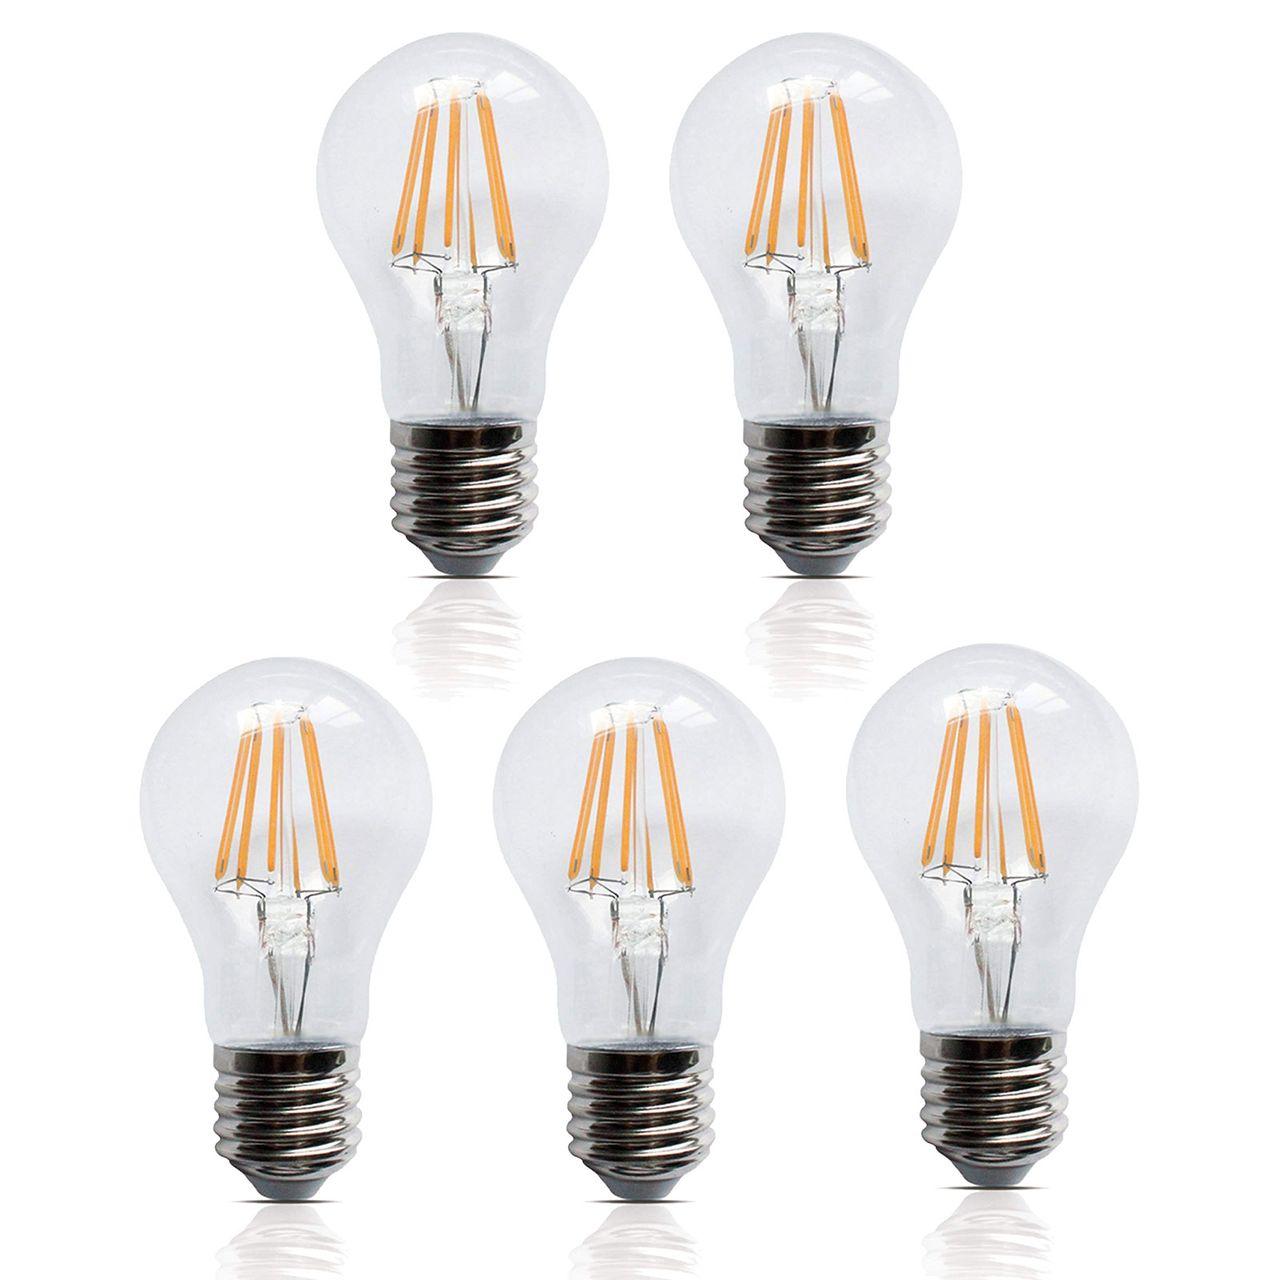 5 Stück LED Filament Leuchte Birne E27 6W 600 Lumen A+ Lampe Glühfaden